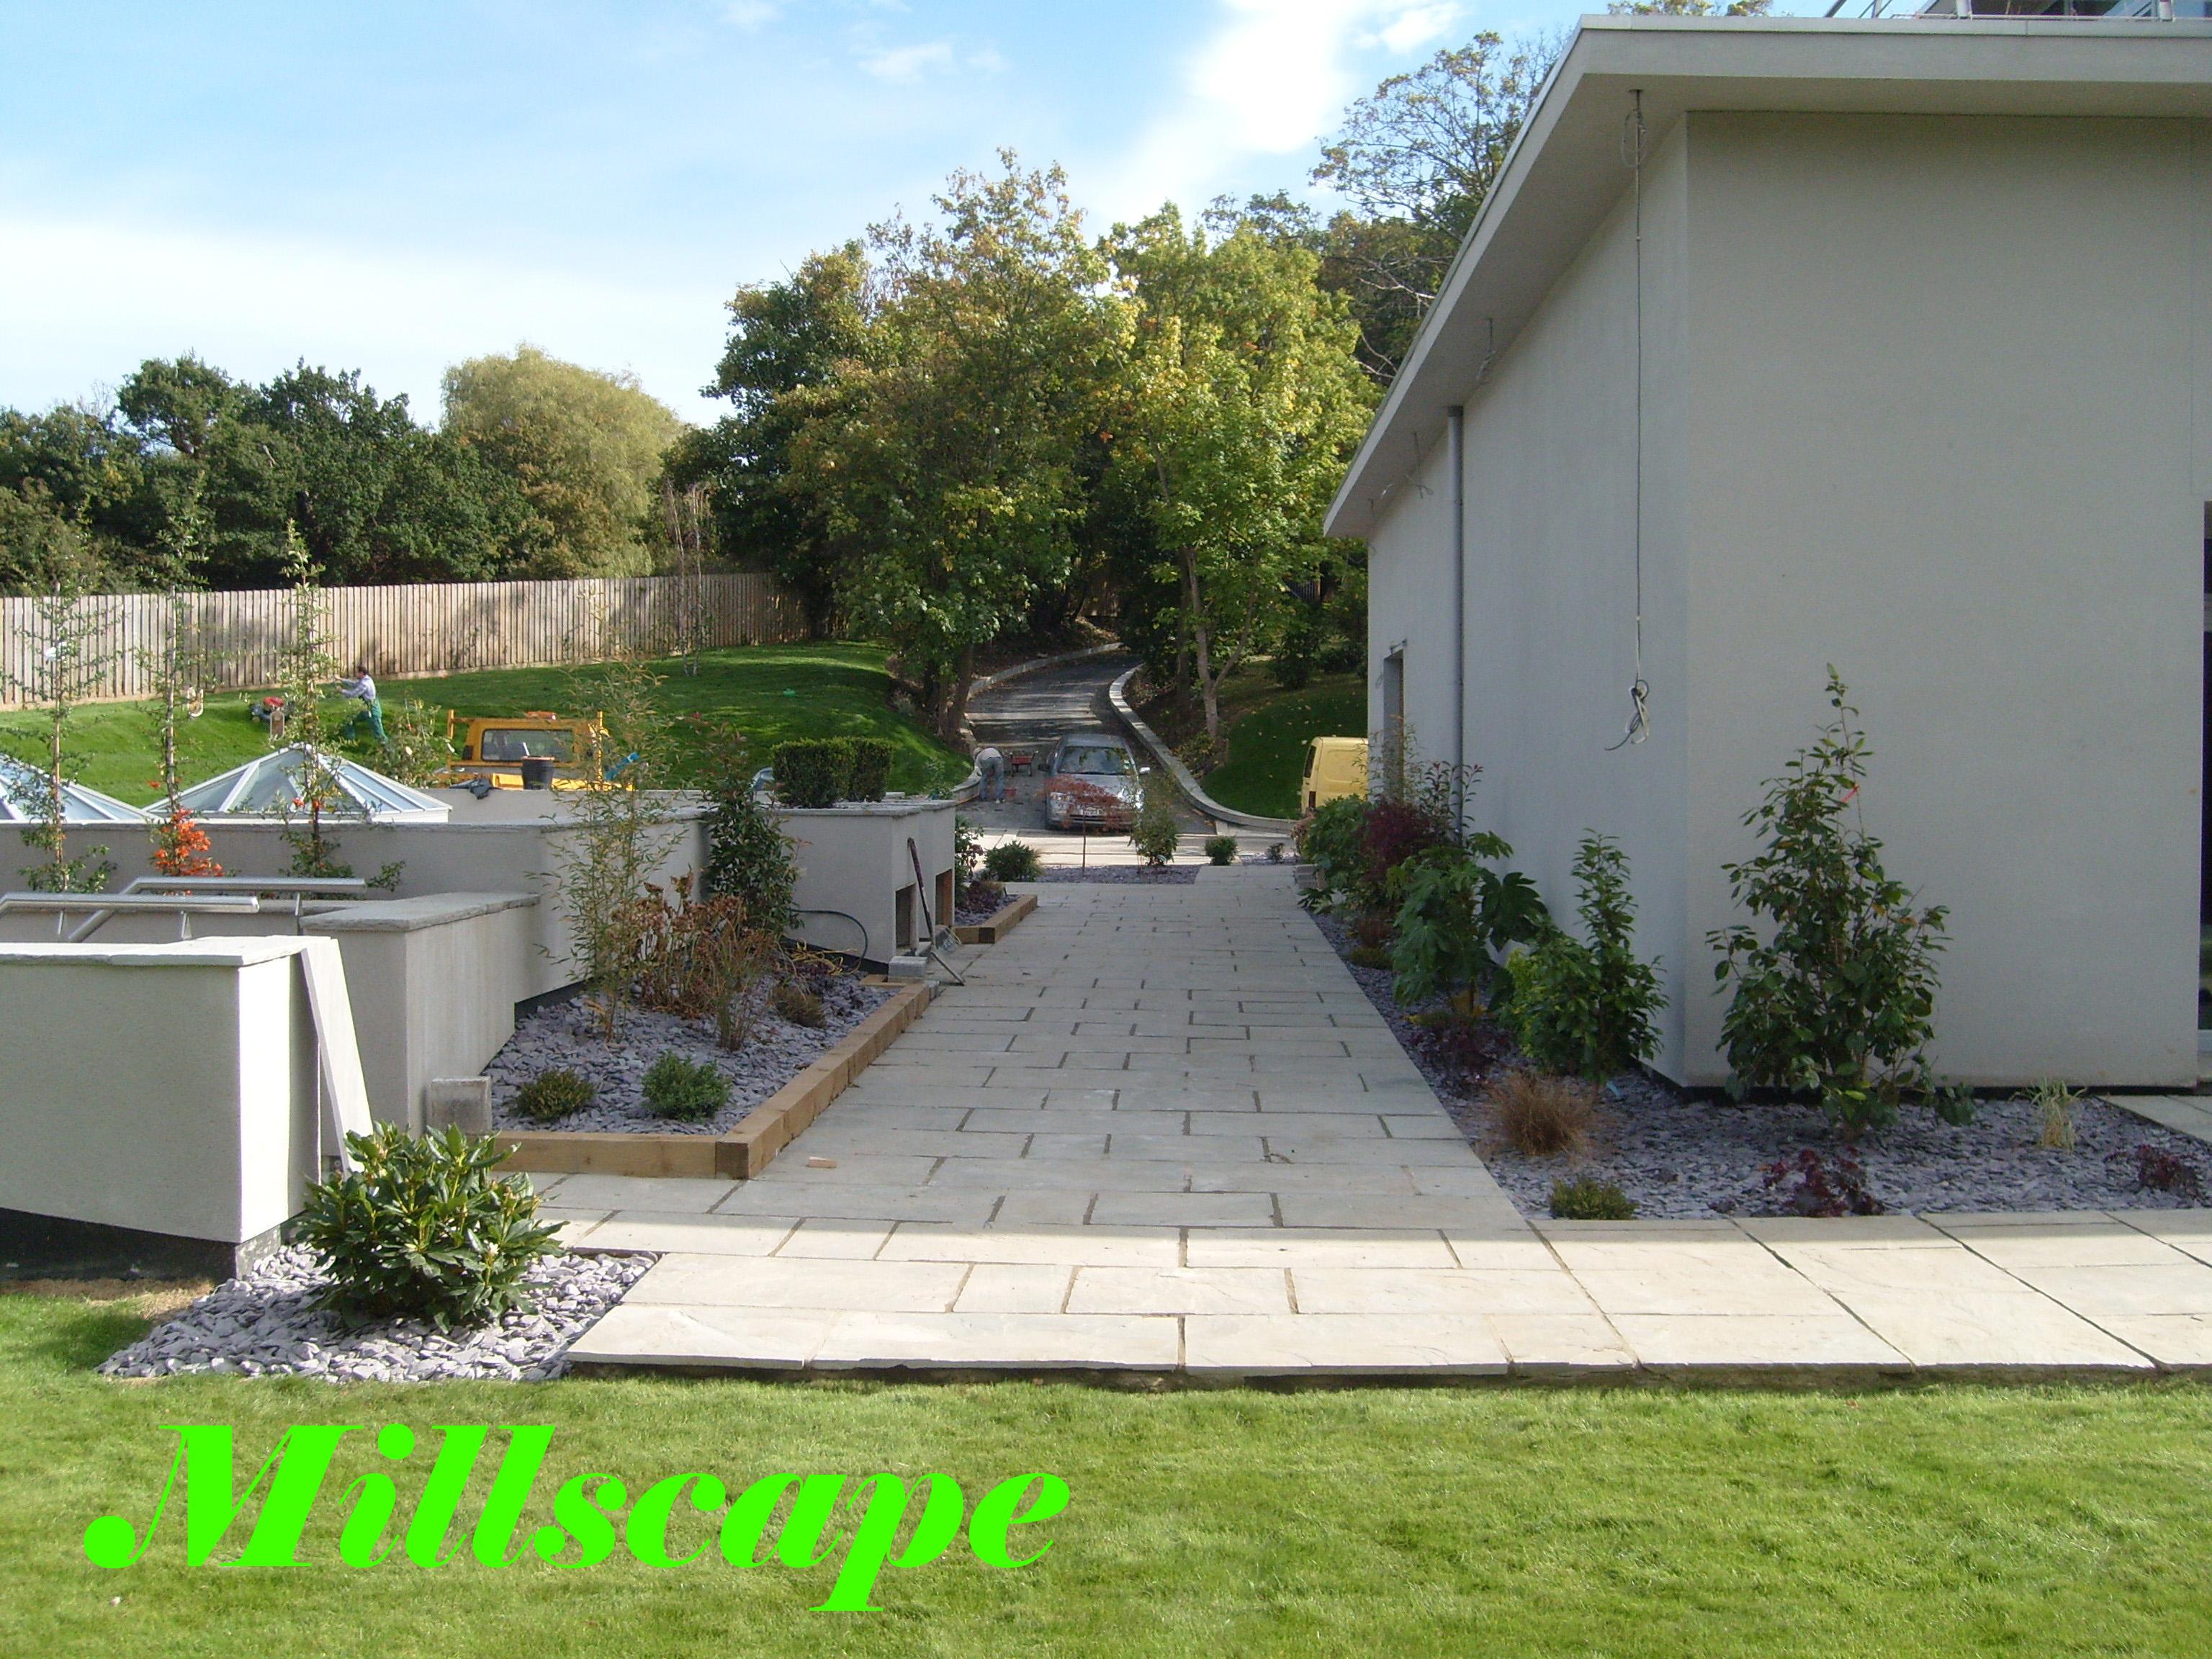 design, landscaping, planting, lawn